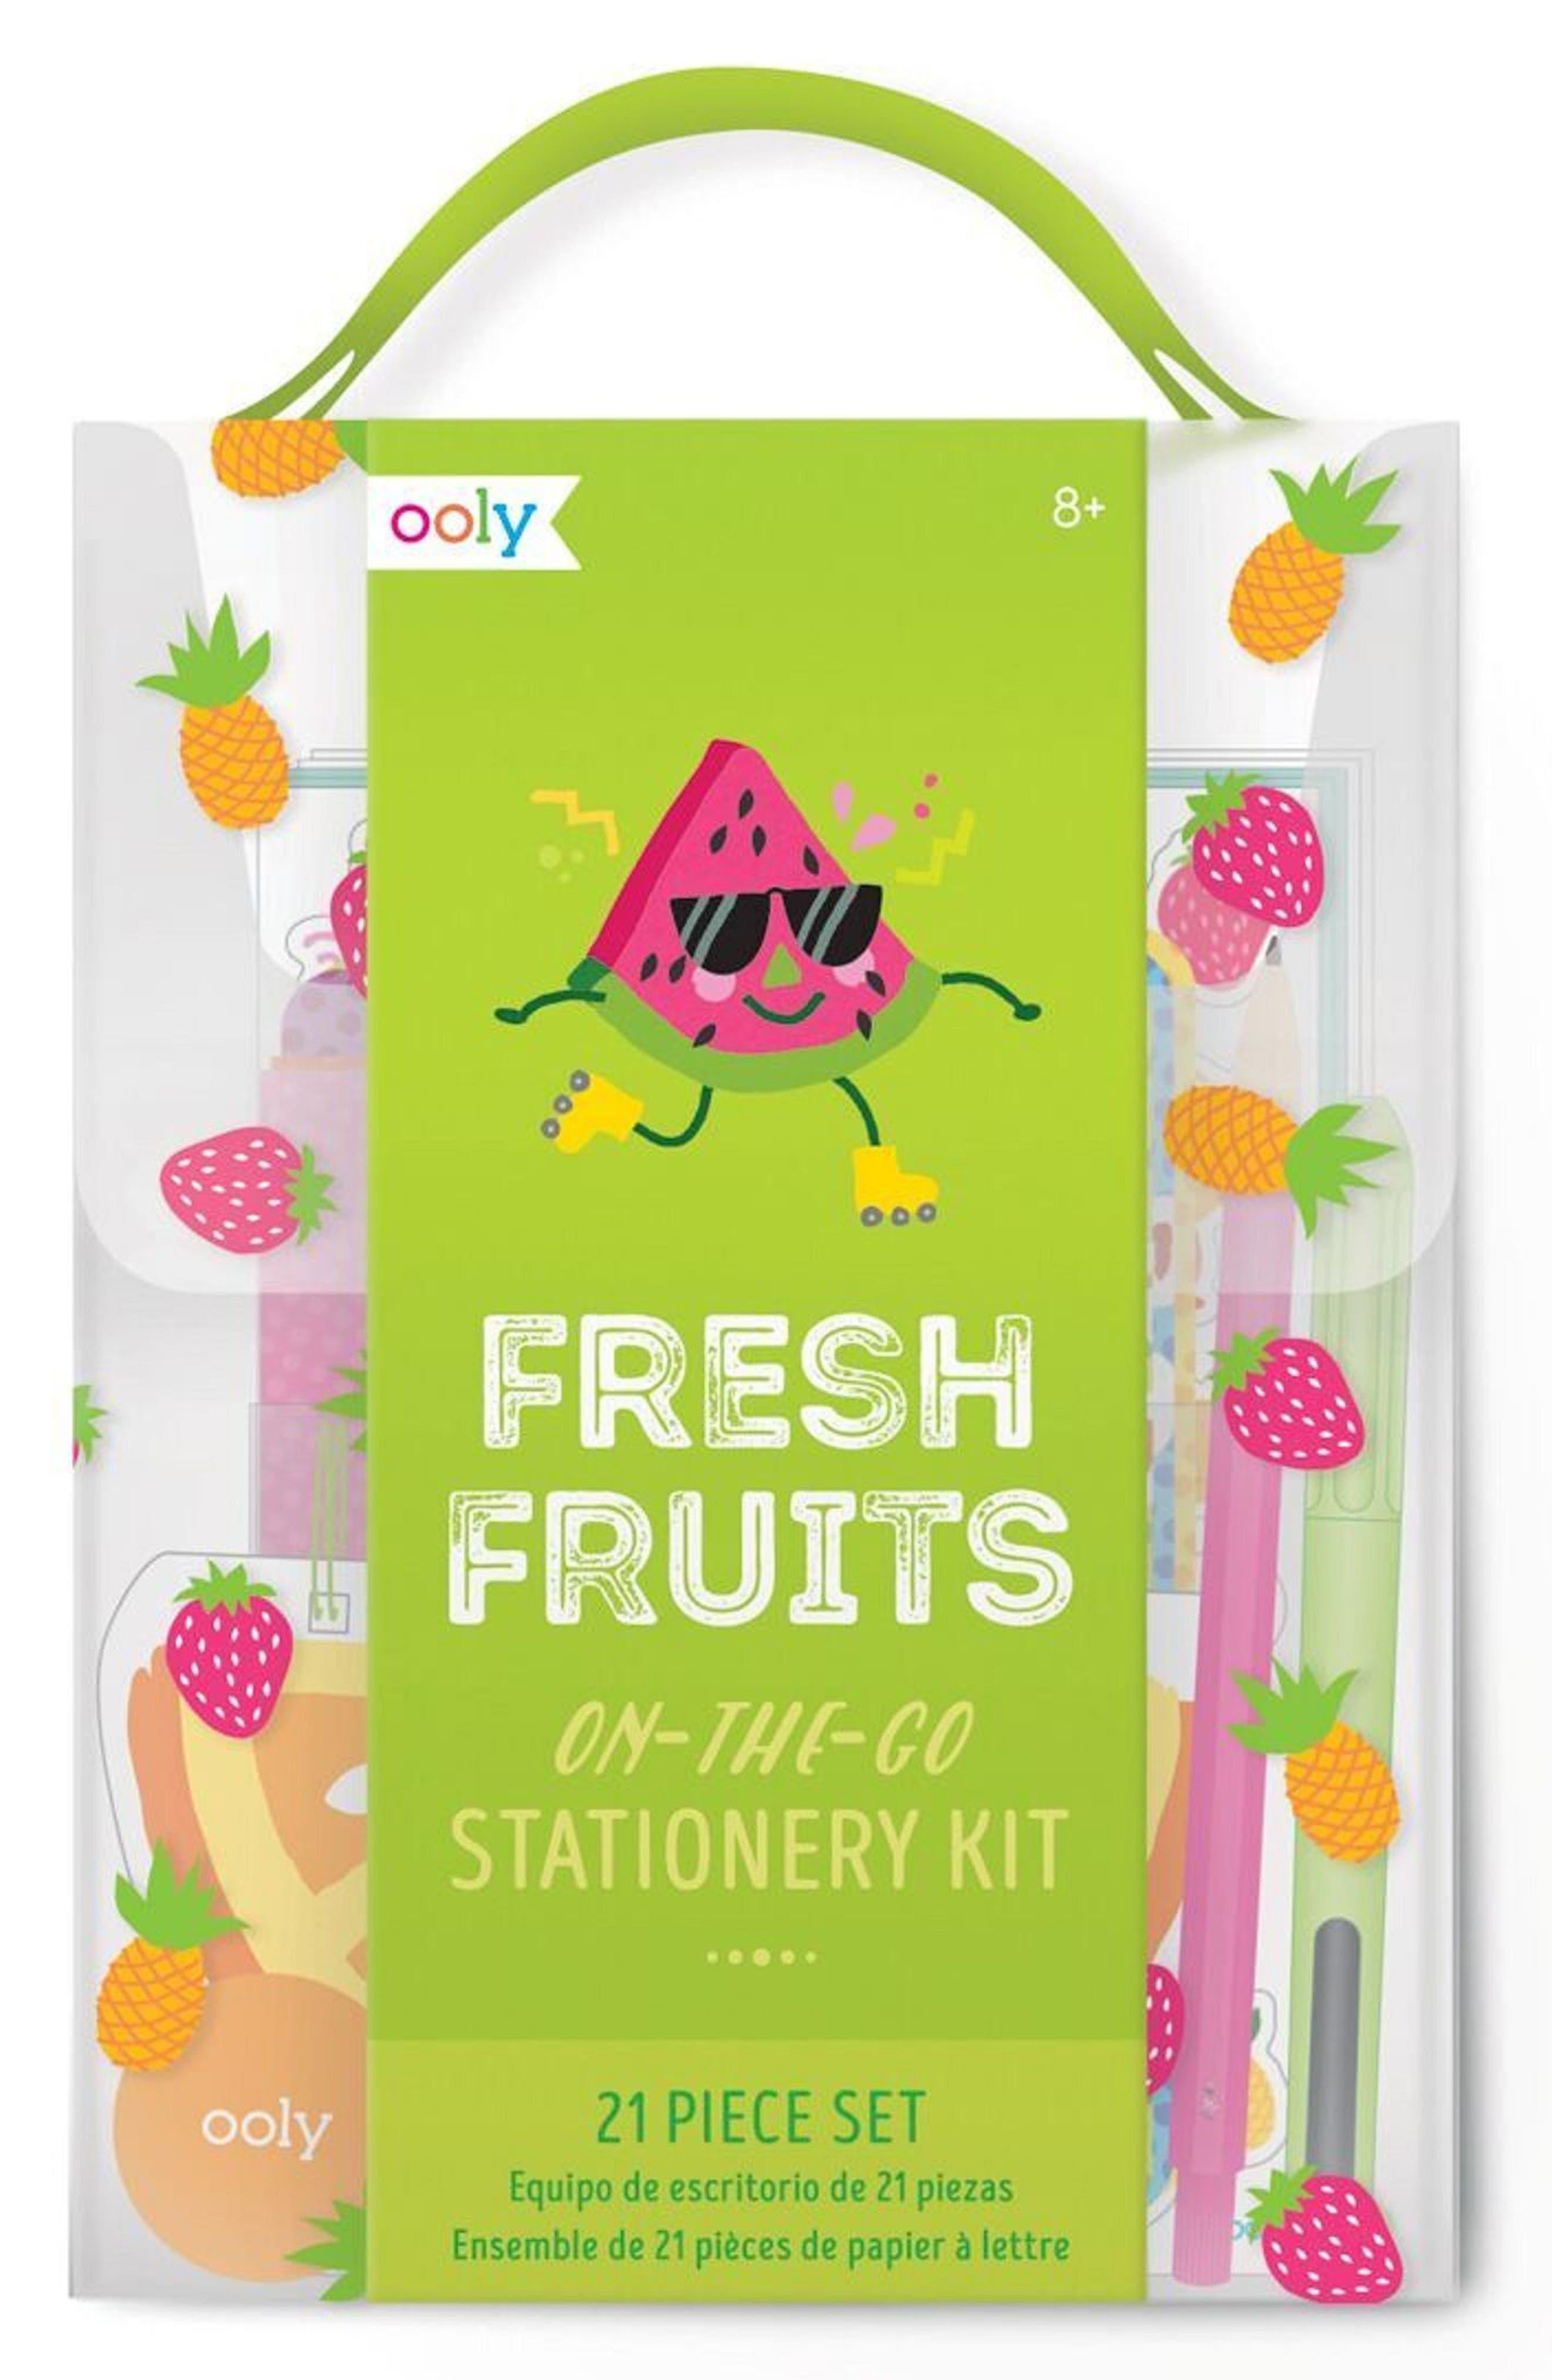 Ooly Fresh Fruit Travel Stationary Kit,                             Main thumbnail 1, color,                             Multi